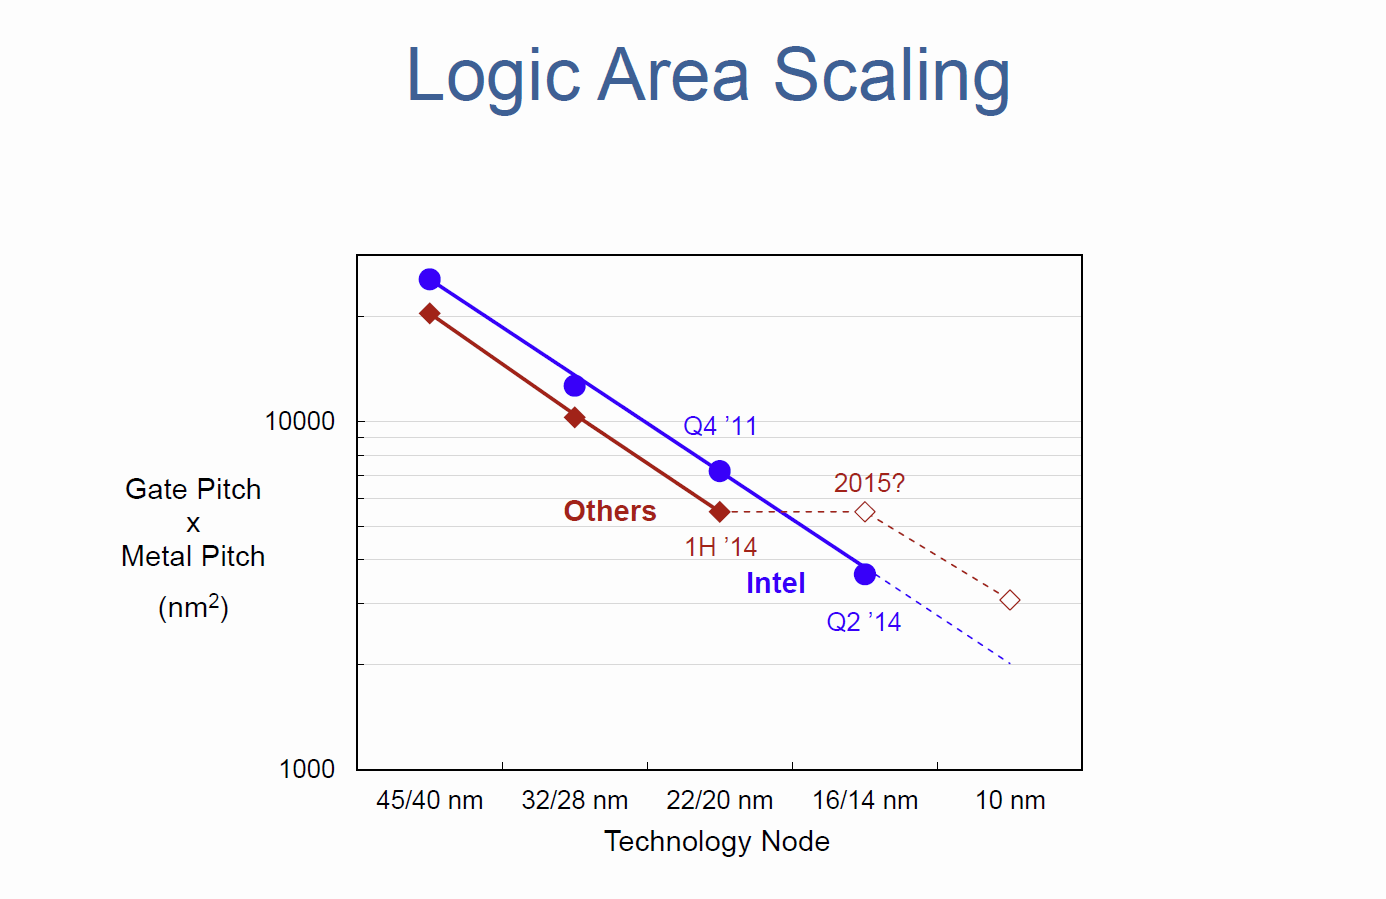 Logic Area Scaling